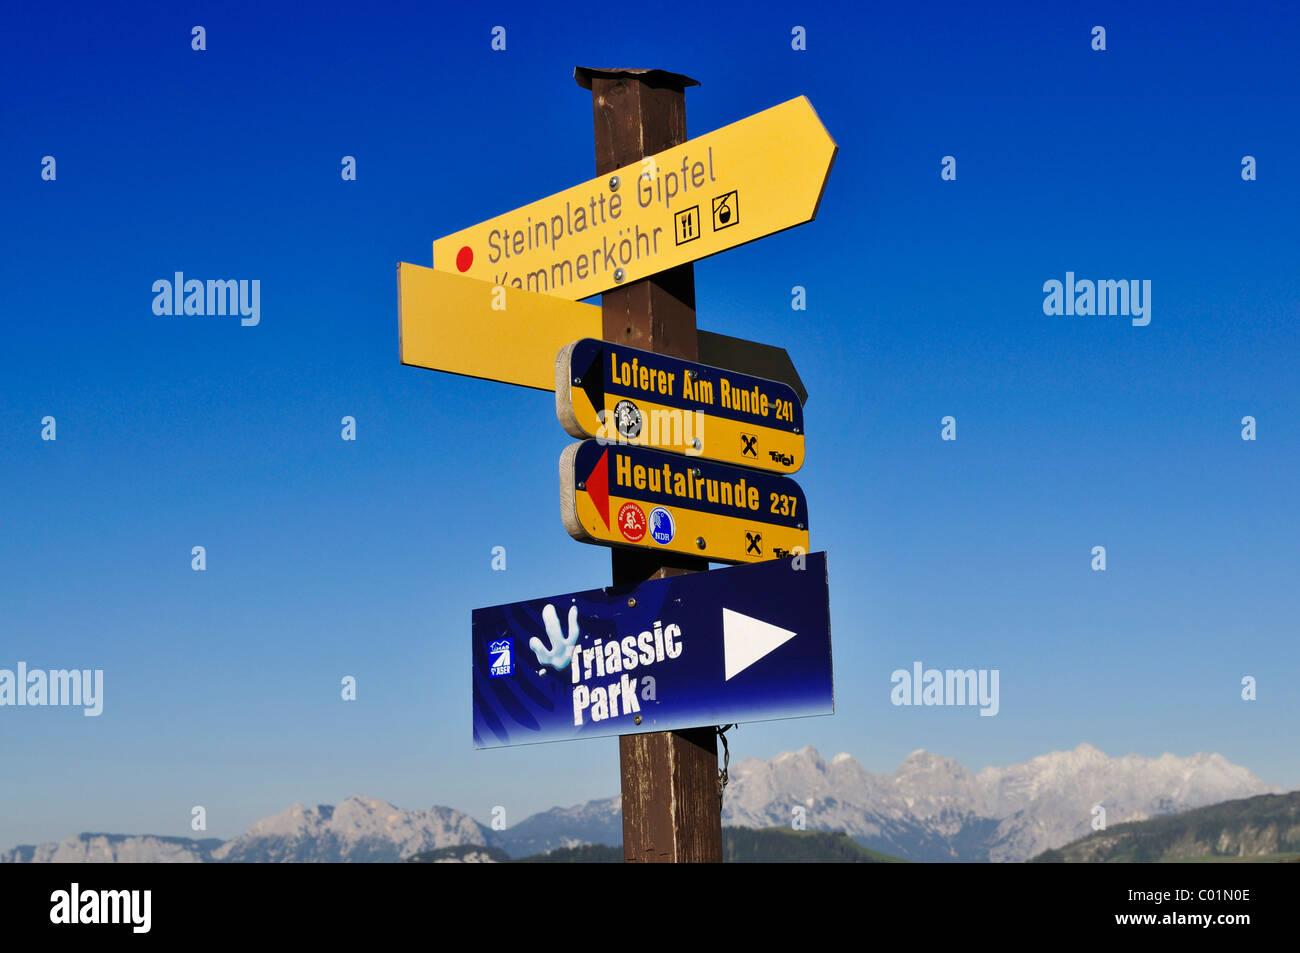 Sign to Steinplatte peak, Triassic Park, Reit im Winkl, Bavaria, Germany, Waidring, Tyrol, Austria, Europe - Stock Image